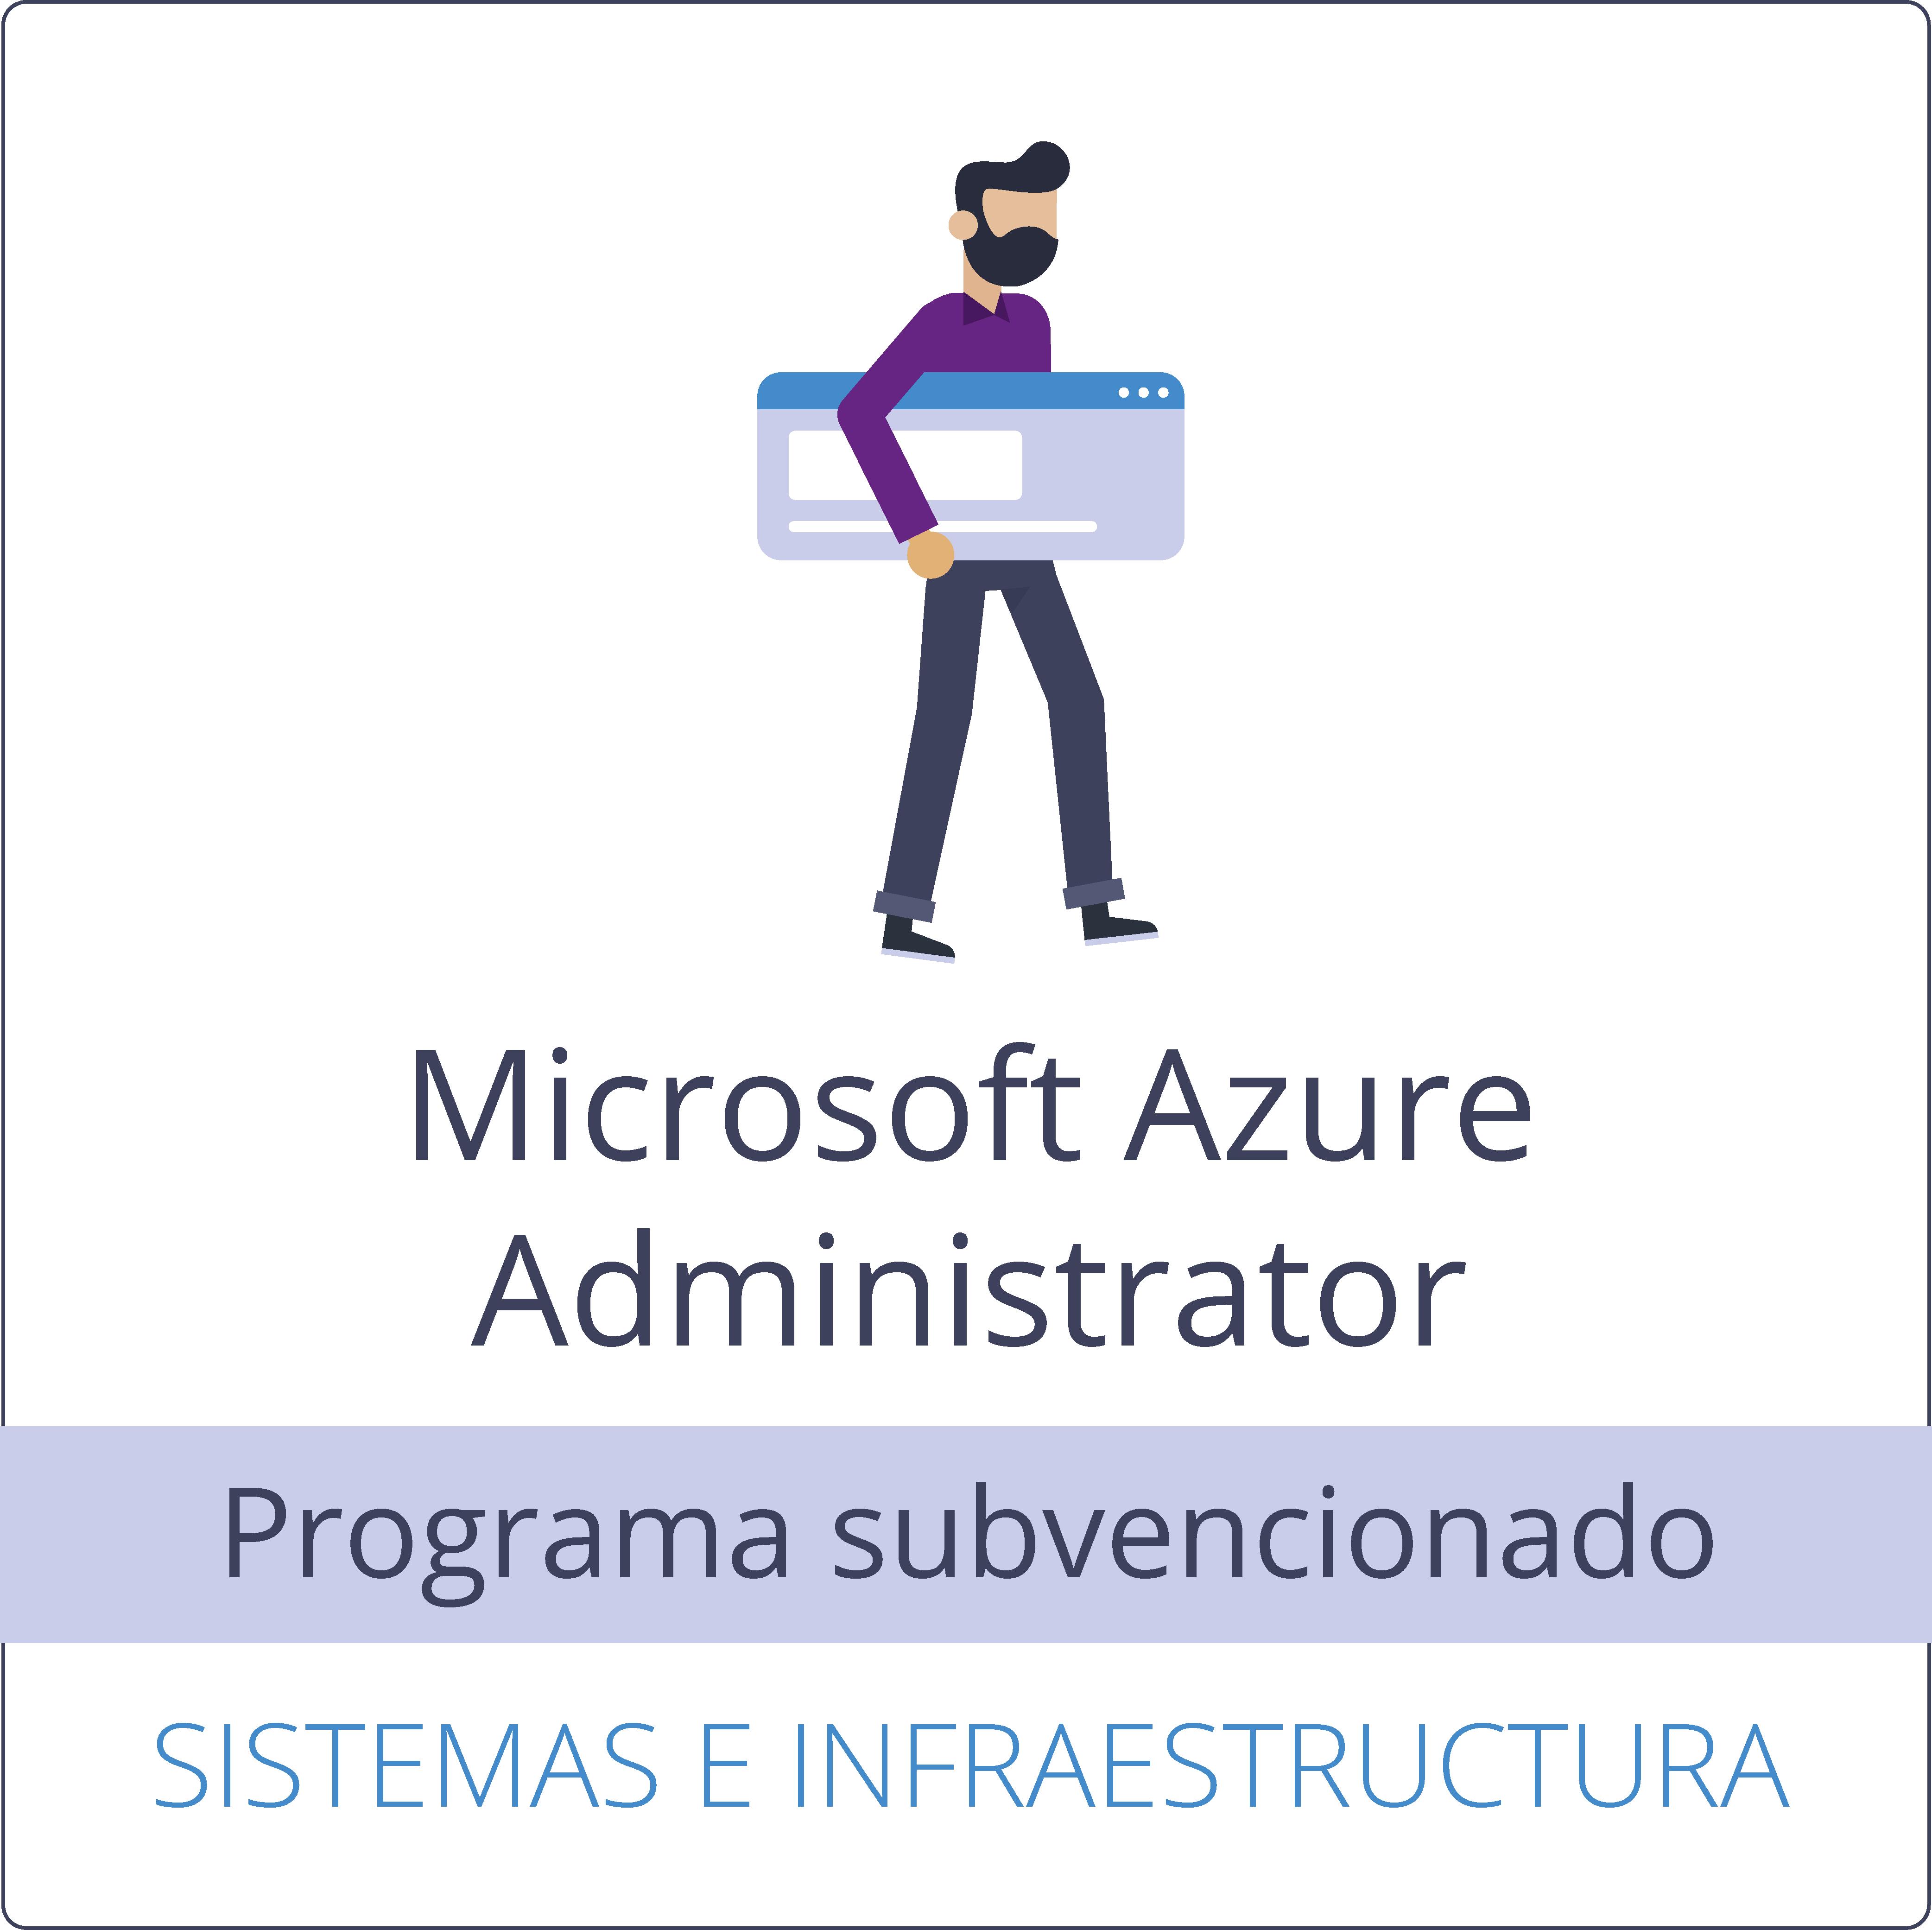 Microsoft Azure Administrator (Subvencionado)